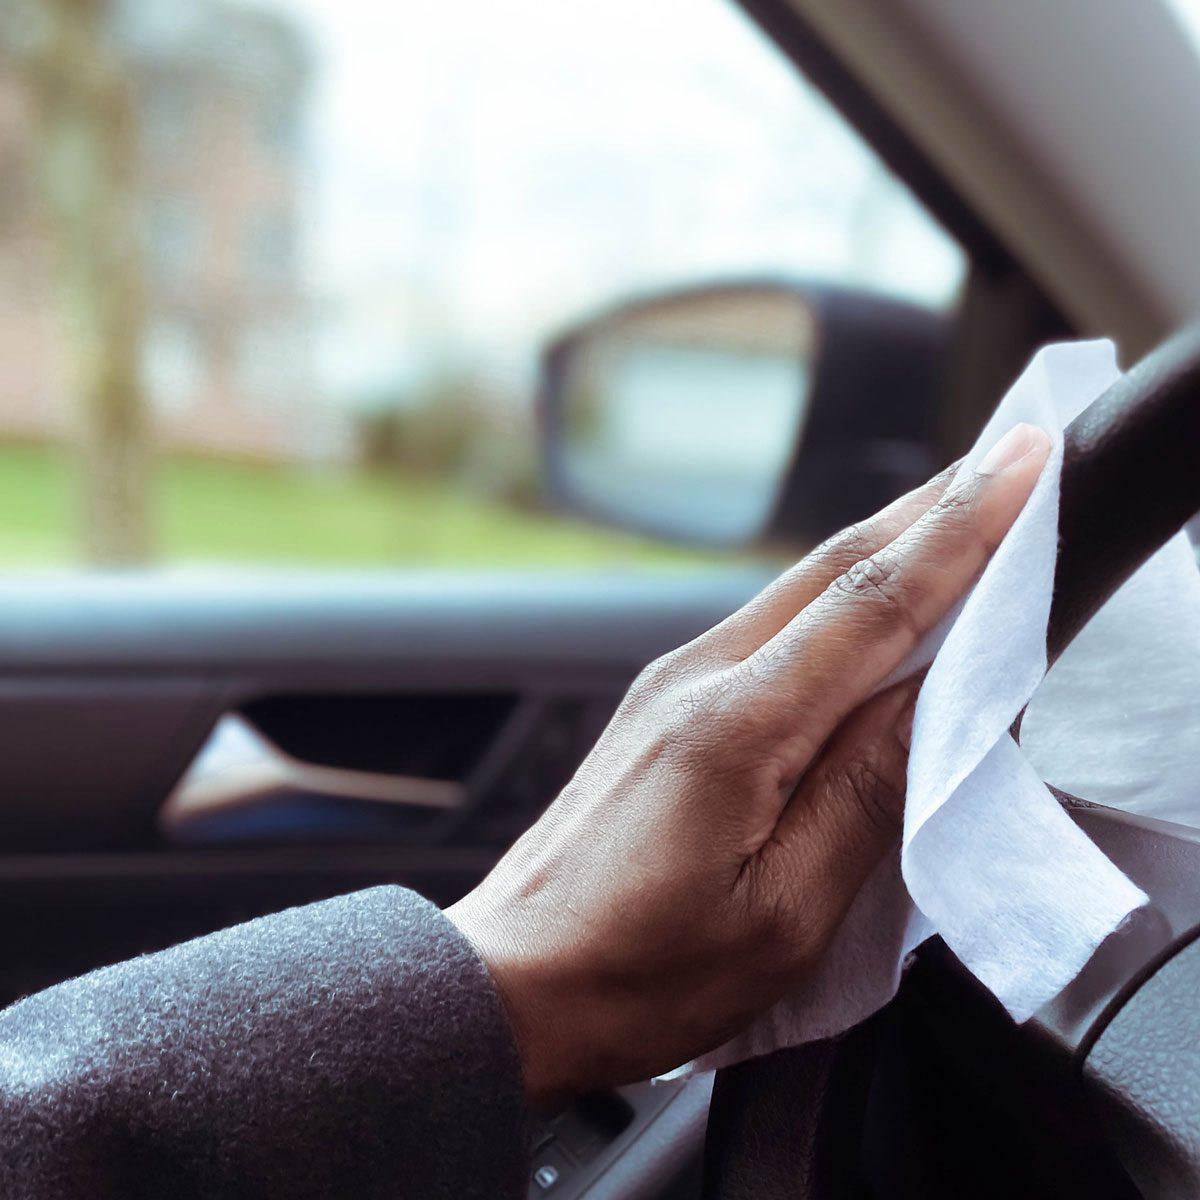 Wiping a steering wheel